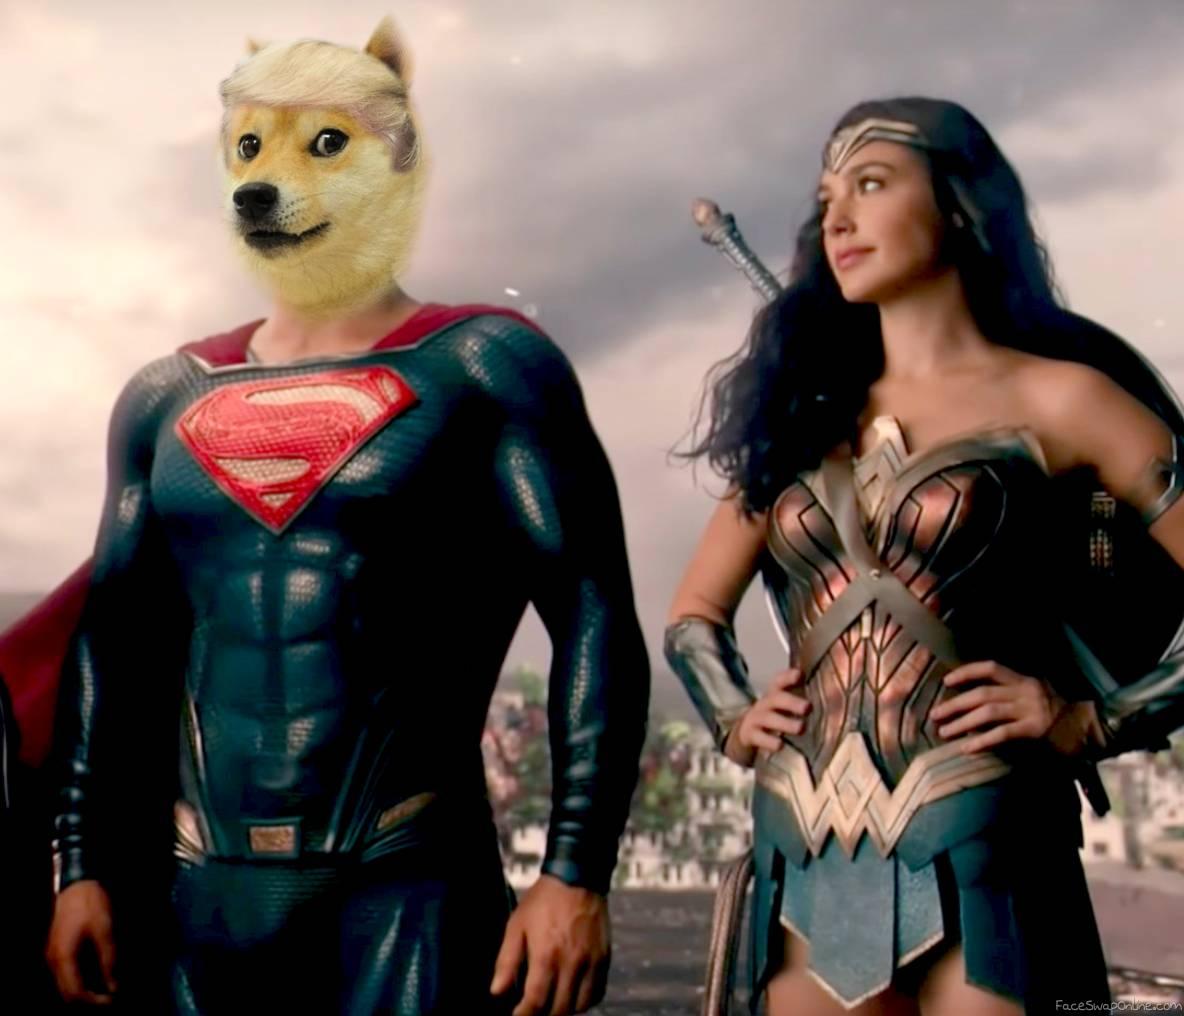 Superdoge and Wonder Woman